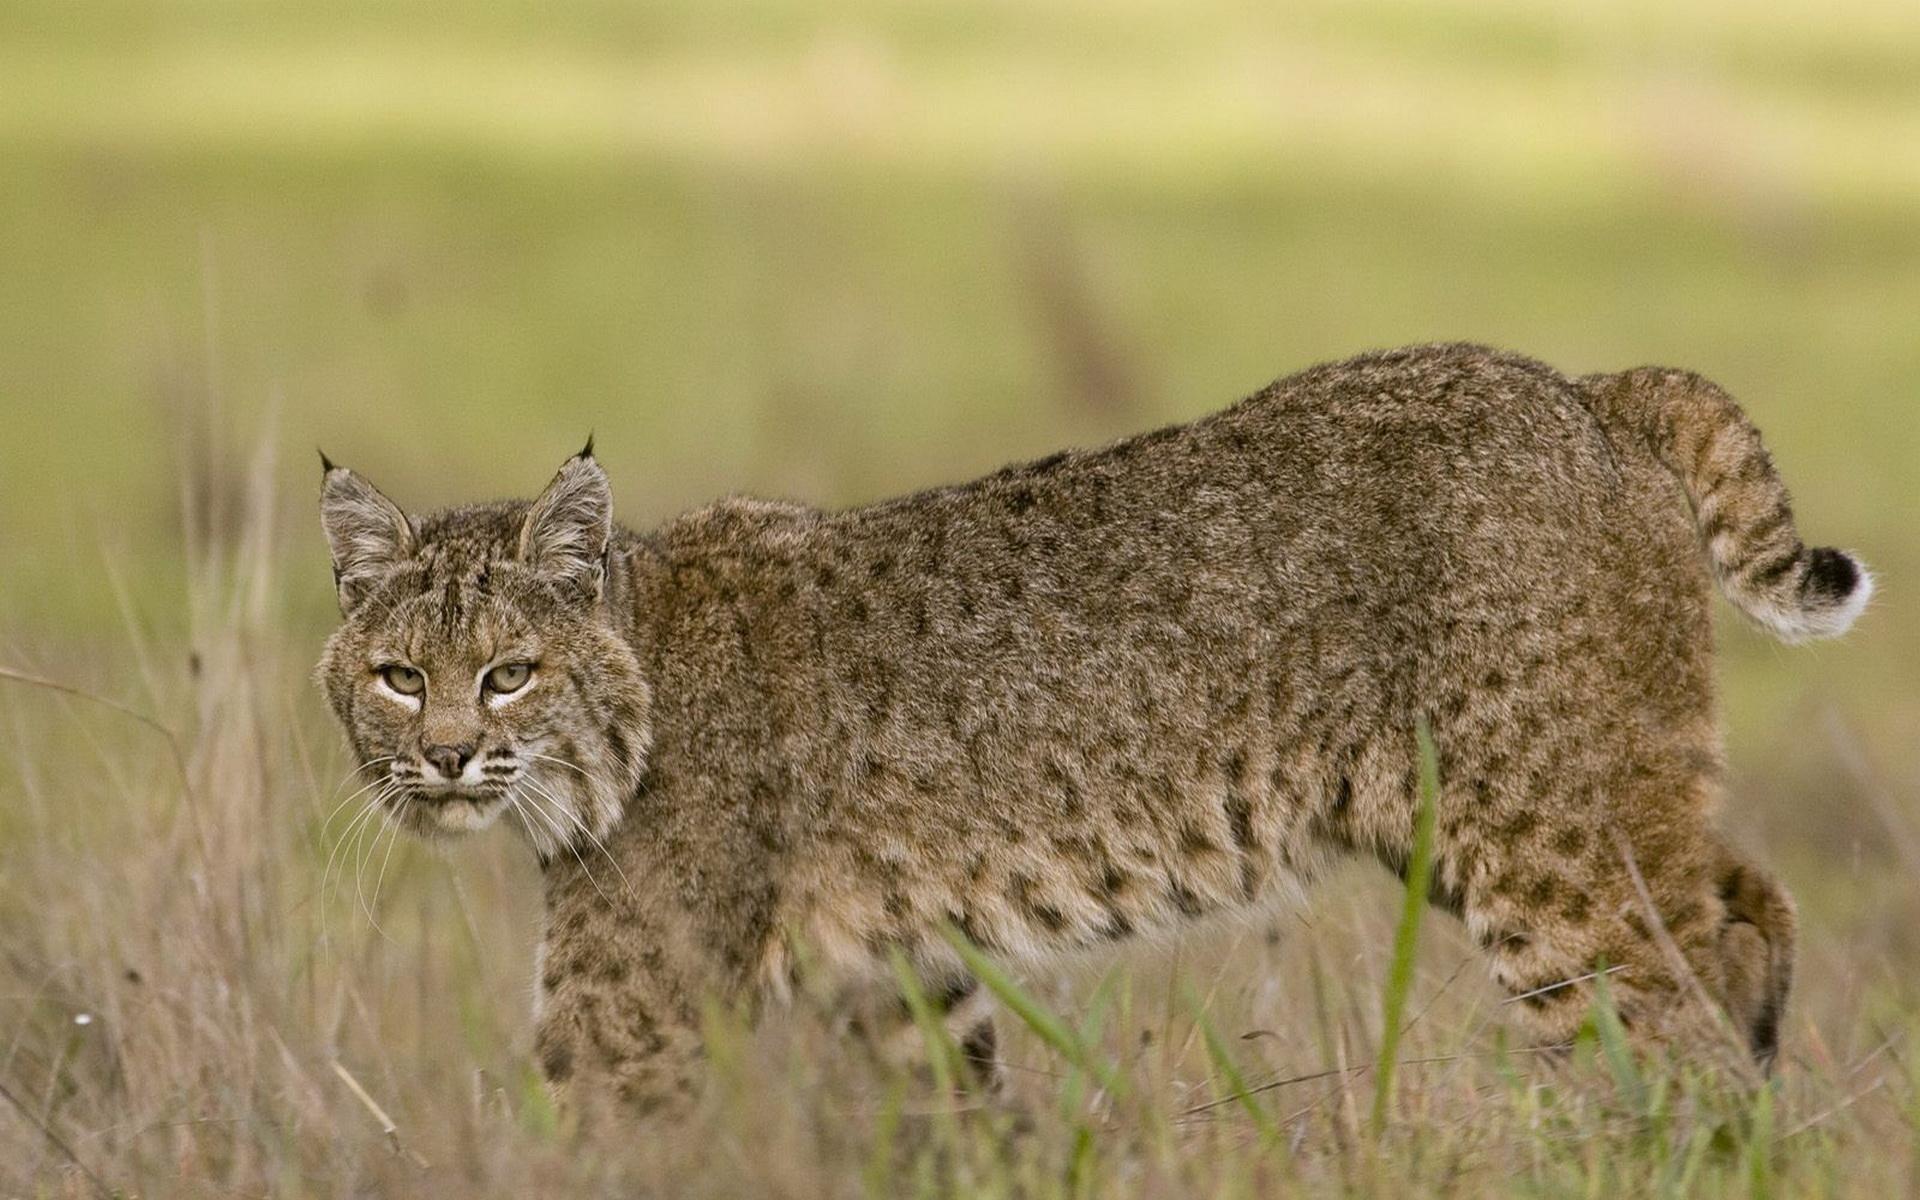 Hd Animal Wallpapers Cool Images Wild Life Download: Bobcat HD Wallpaper